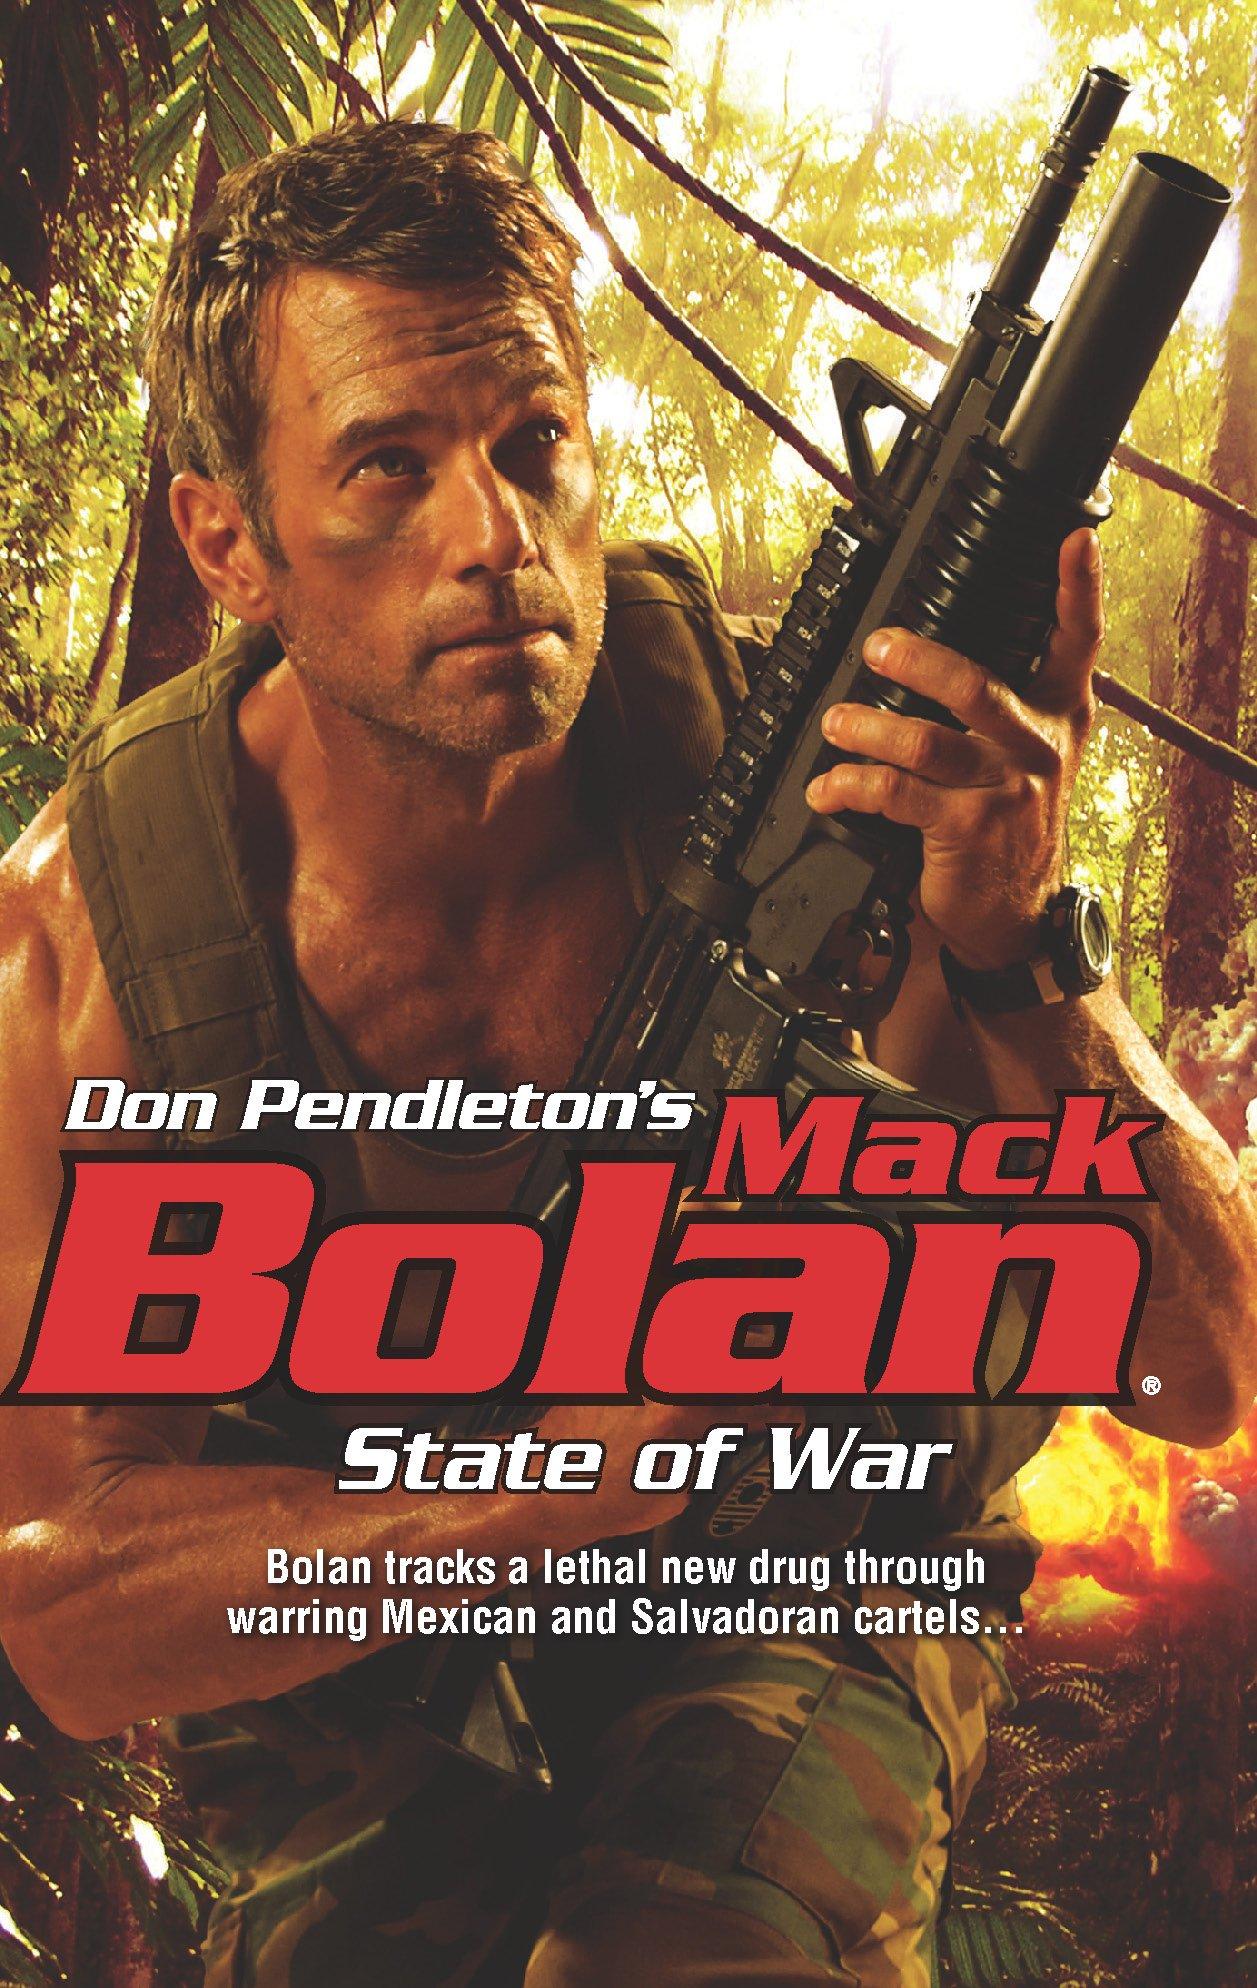 Amazon.com: State of War (Mack Bolan) (9780373615575): Don Pendleton: Books